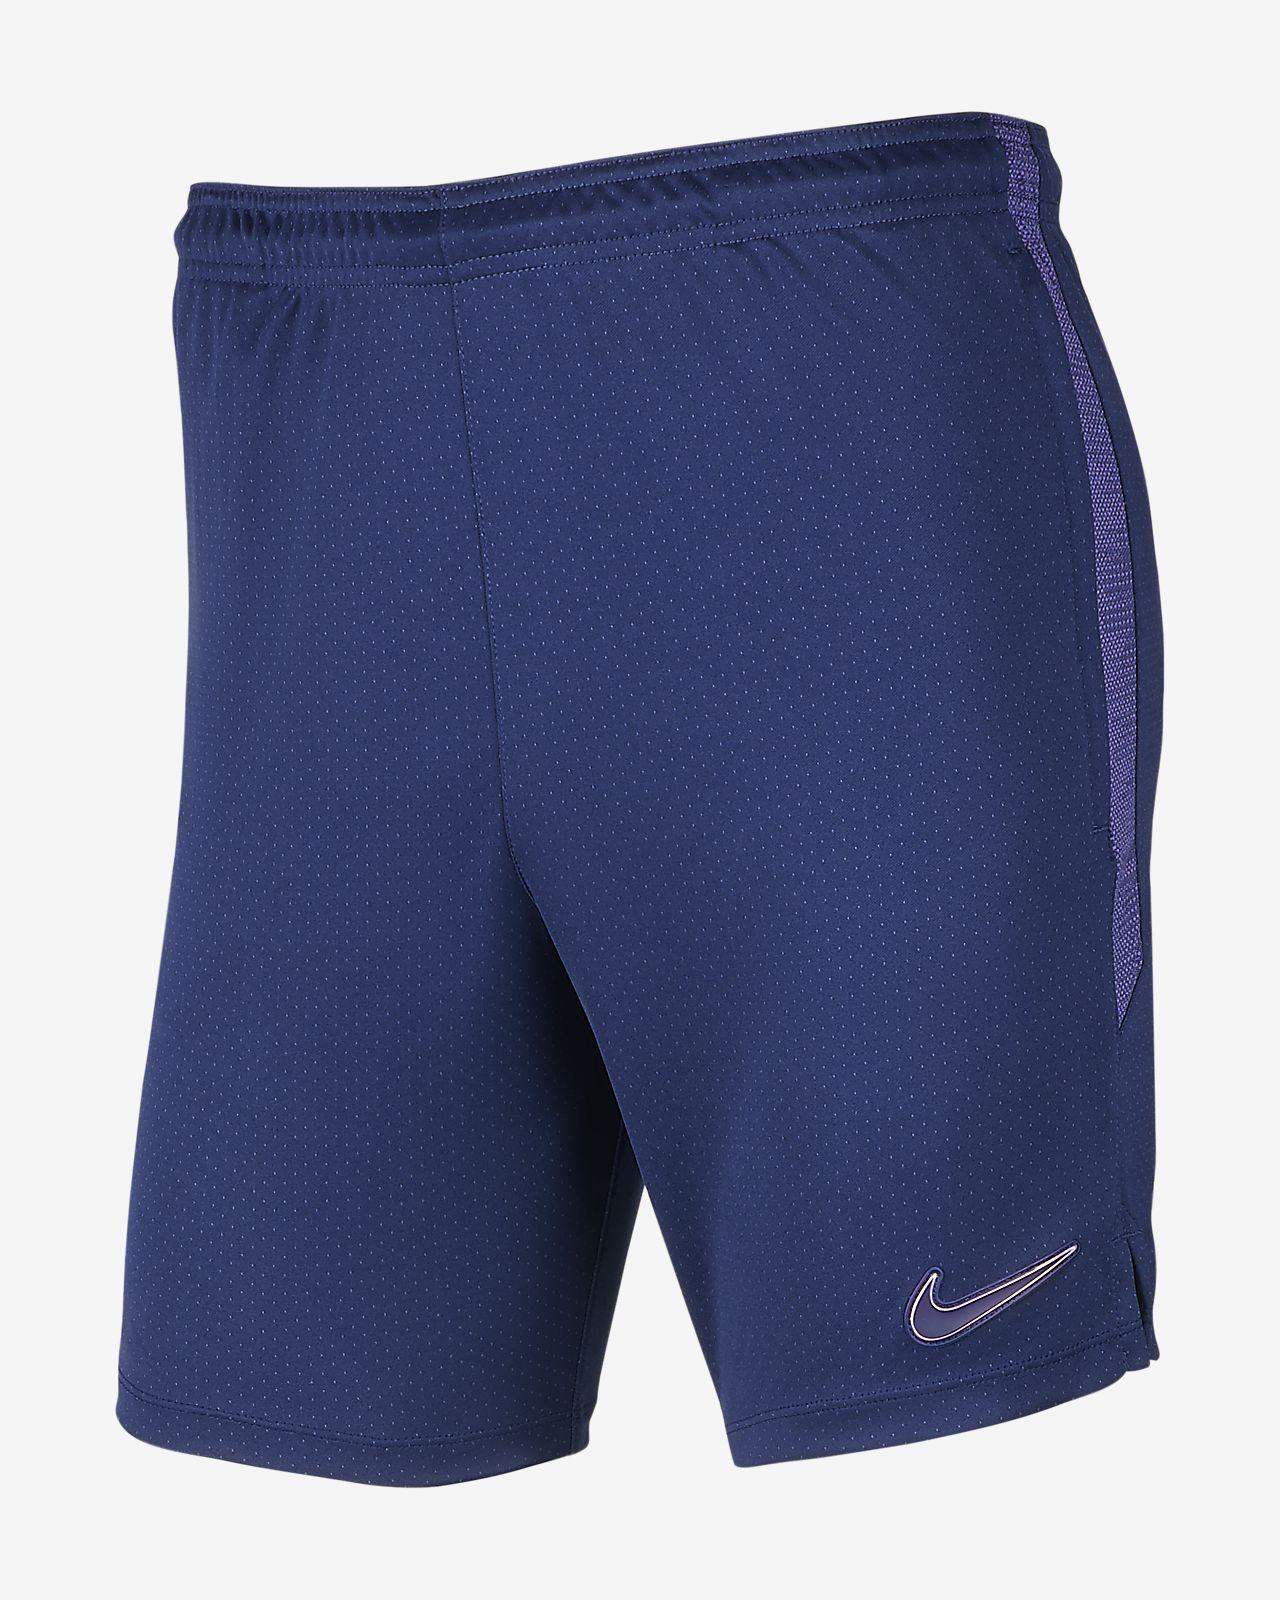 Nike Dri-FIT Tottenham Hotspur HerrenFußballshorts